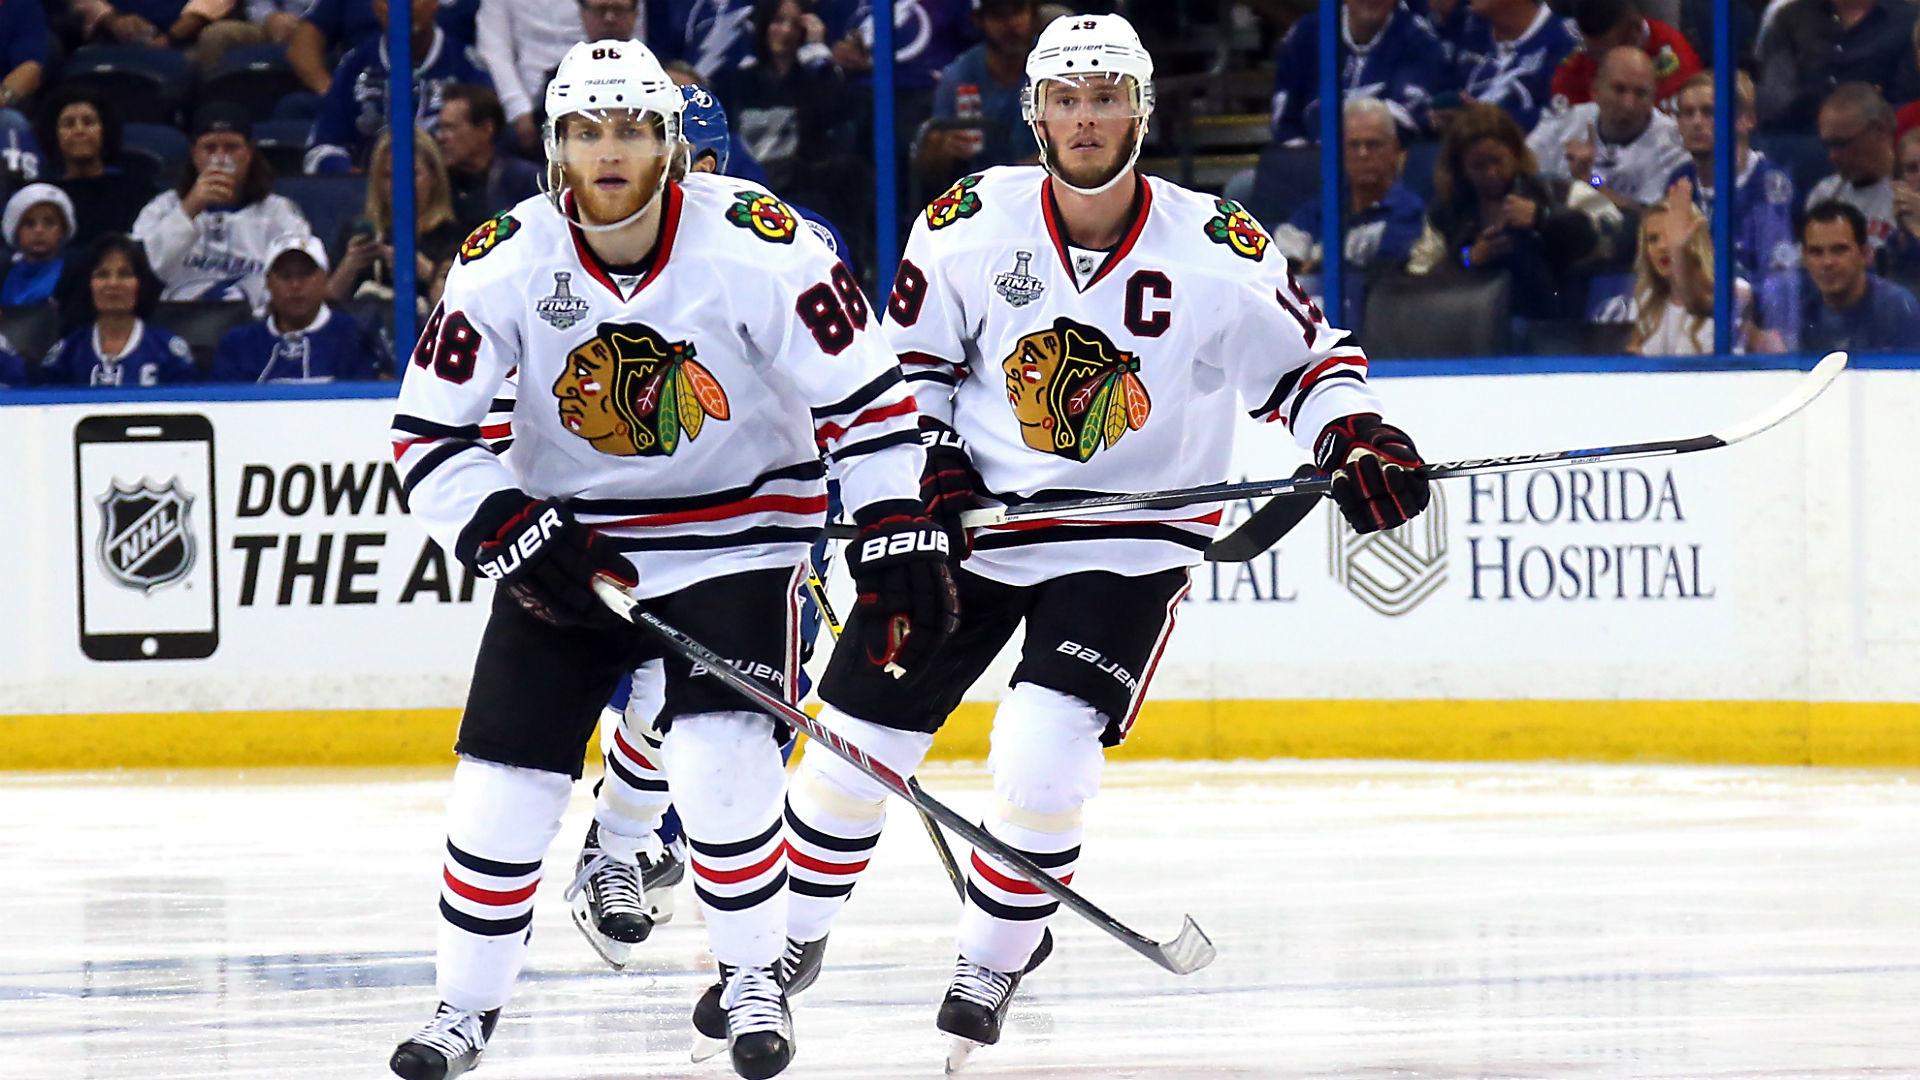 Blackhawks' fix should start with splitting Patrick Kane, Jonathan Toews |  NHL | Sporting News